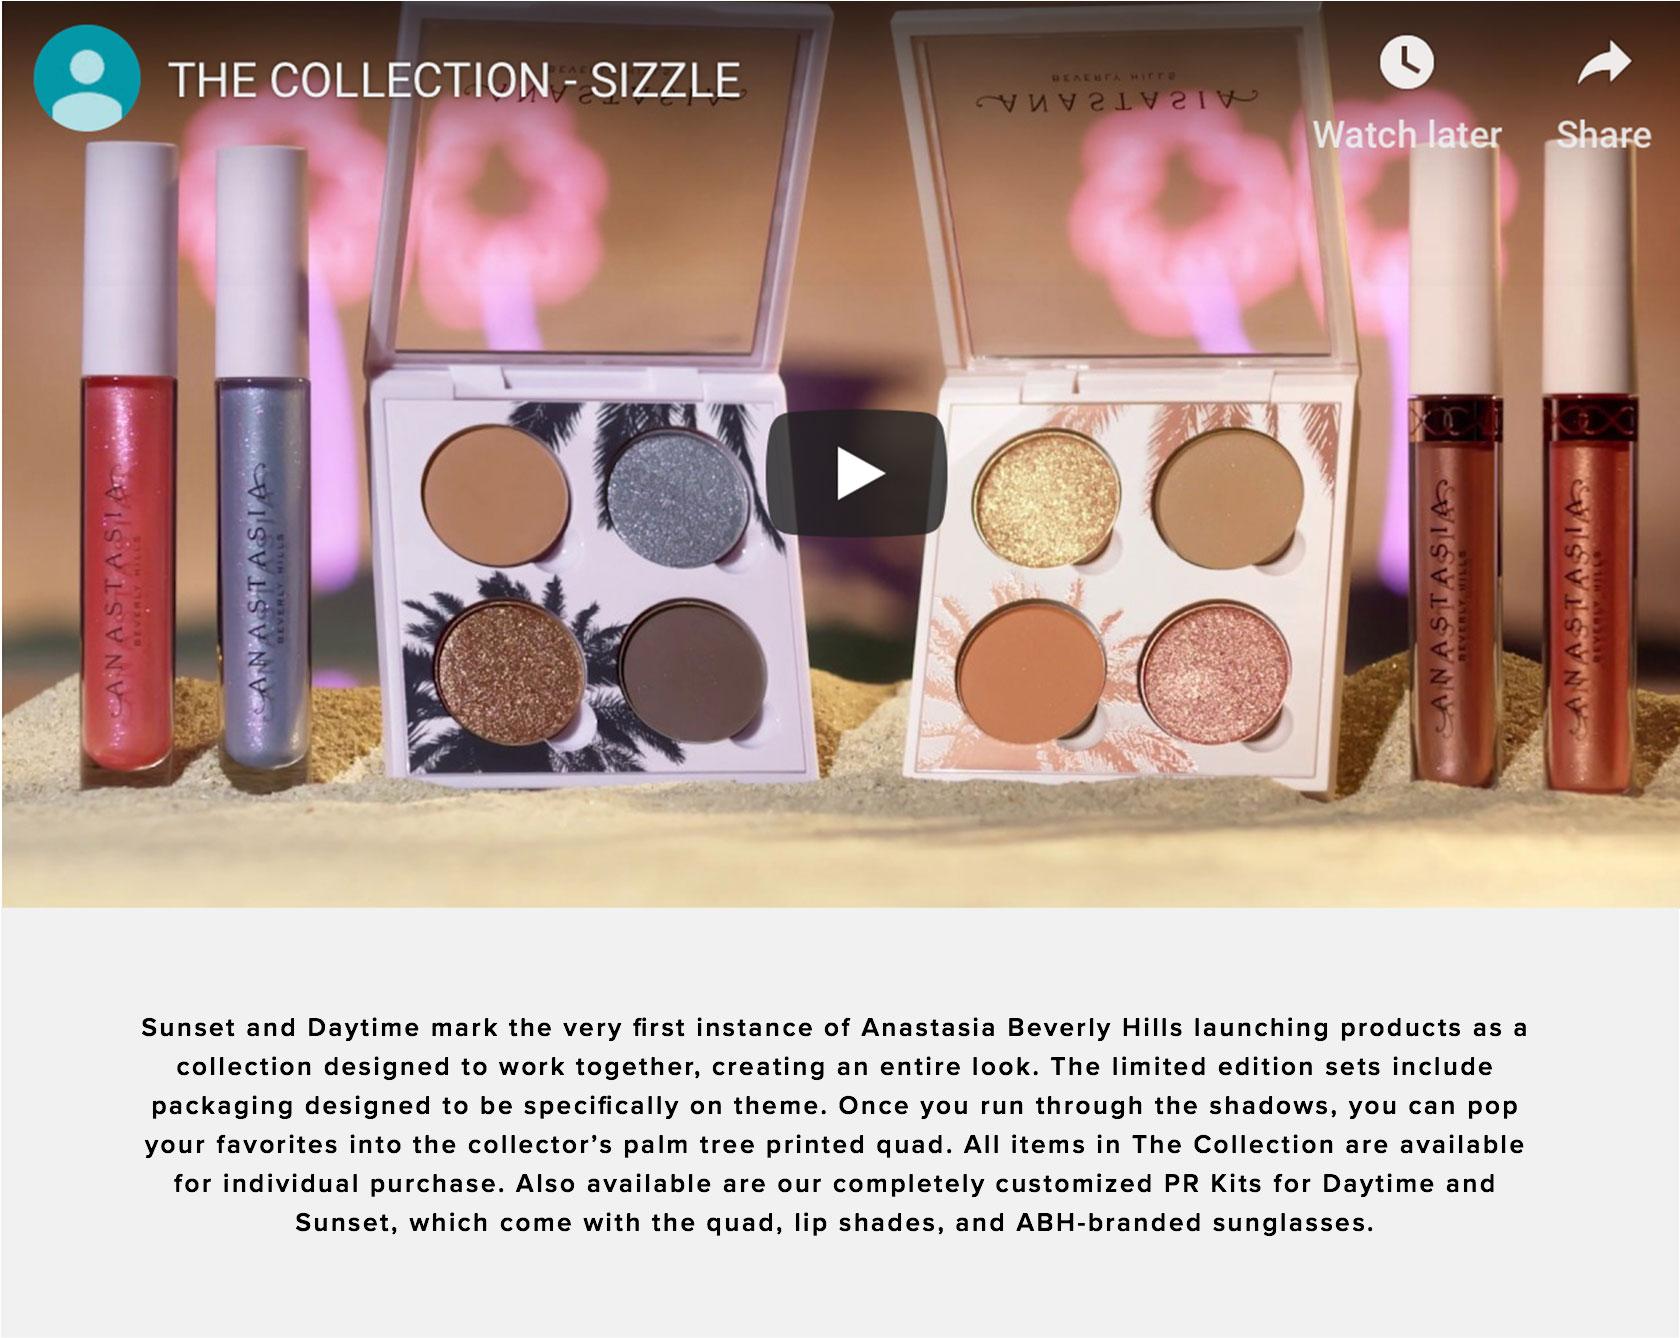 sizzlevideo-new